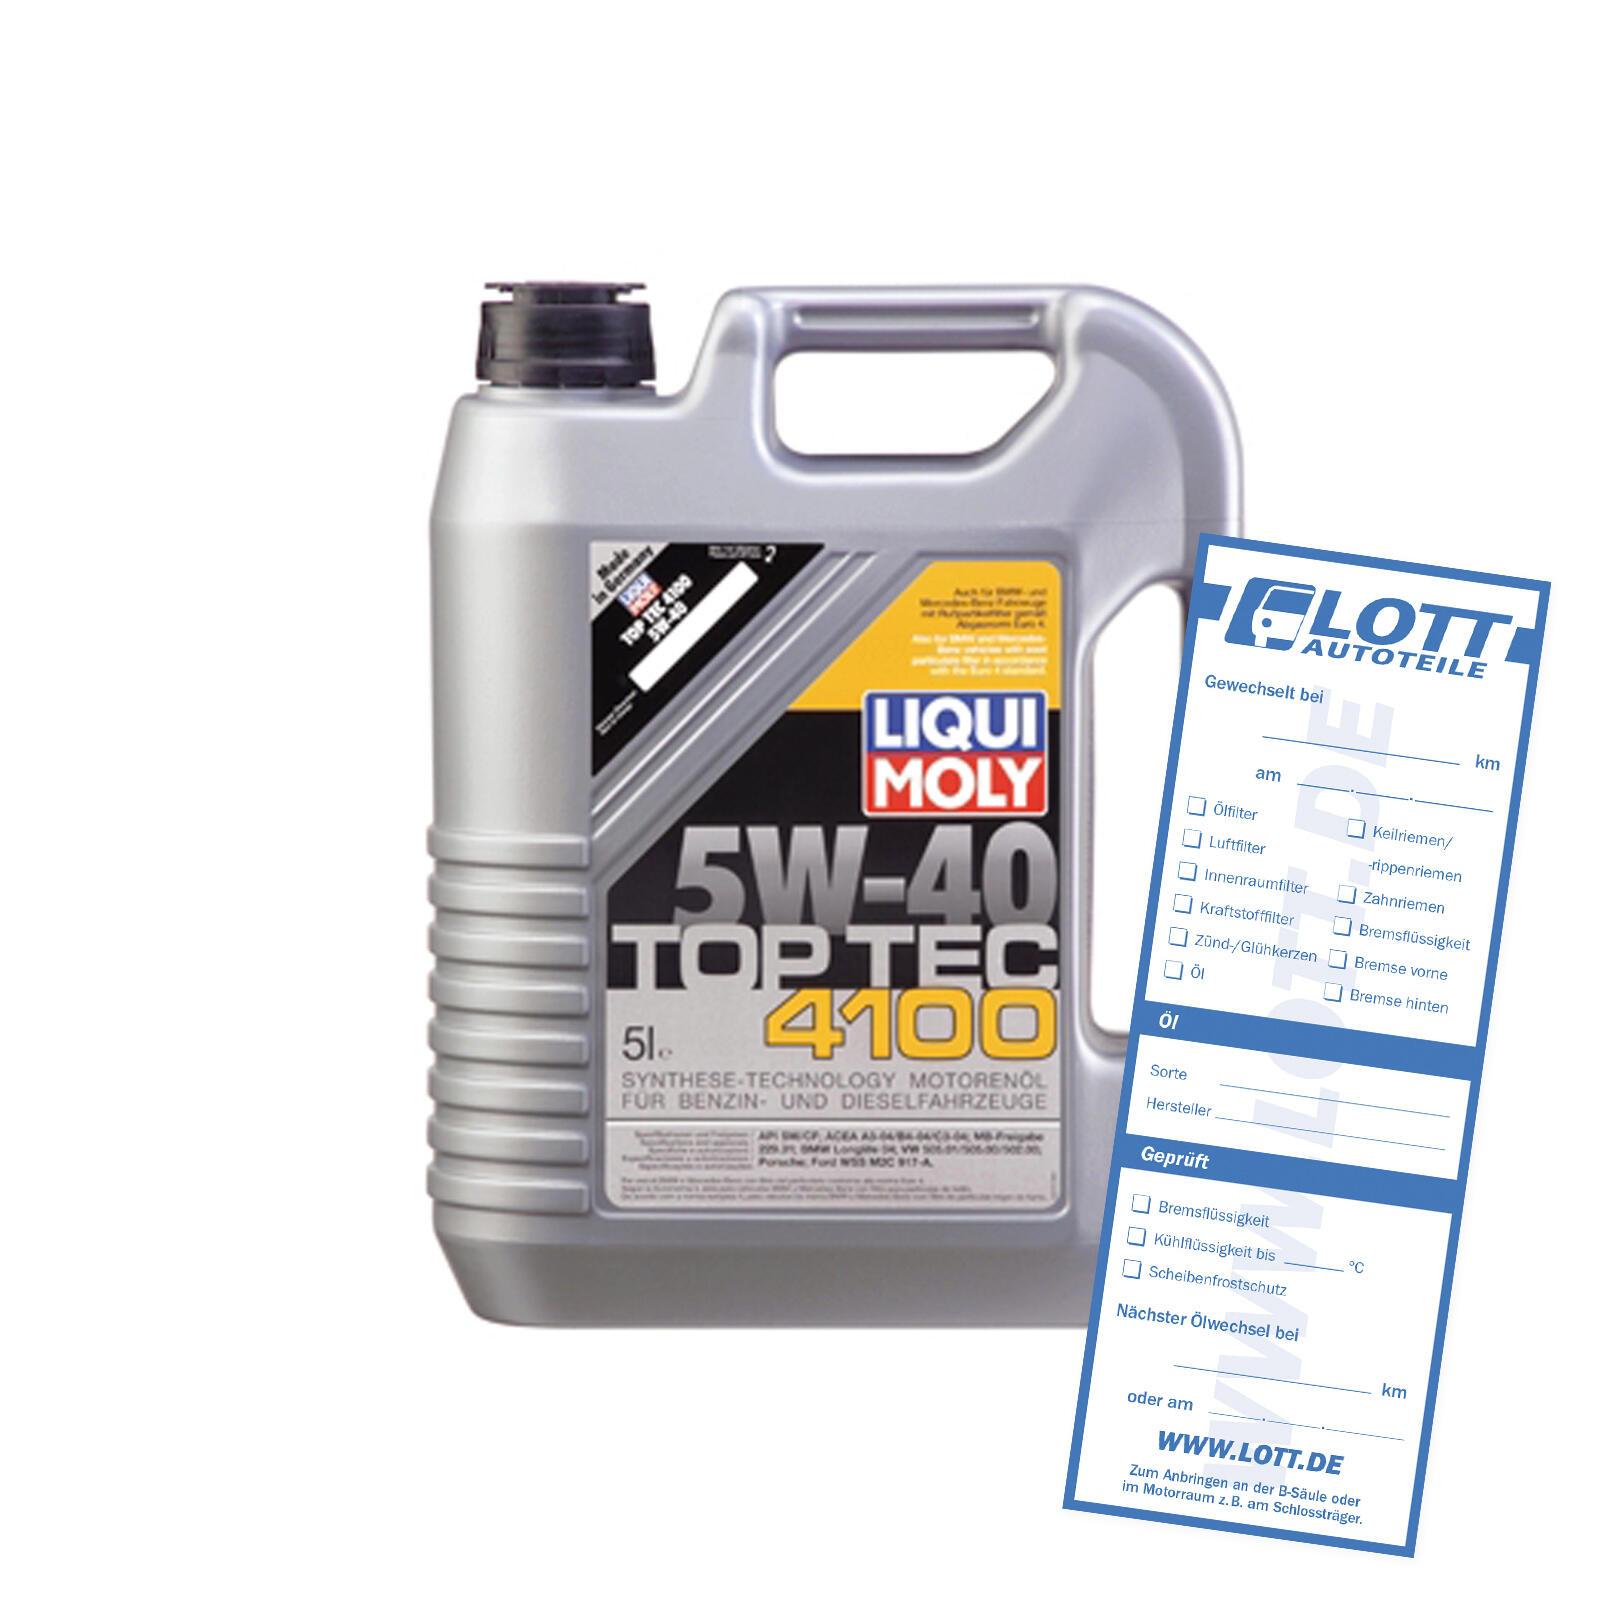 Liqui Moly Leichtlaufmotorenöl Top Tec 4100 5W-40